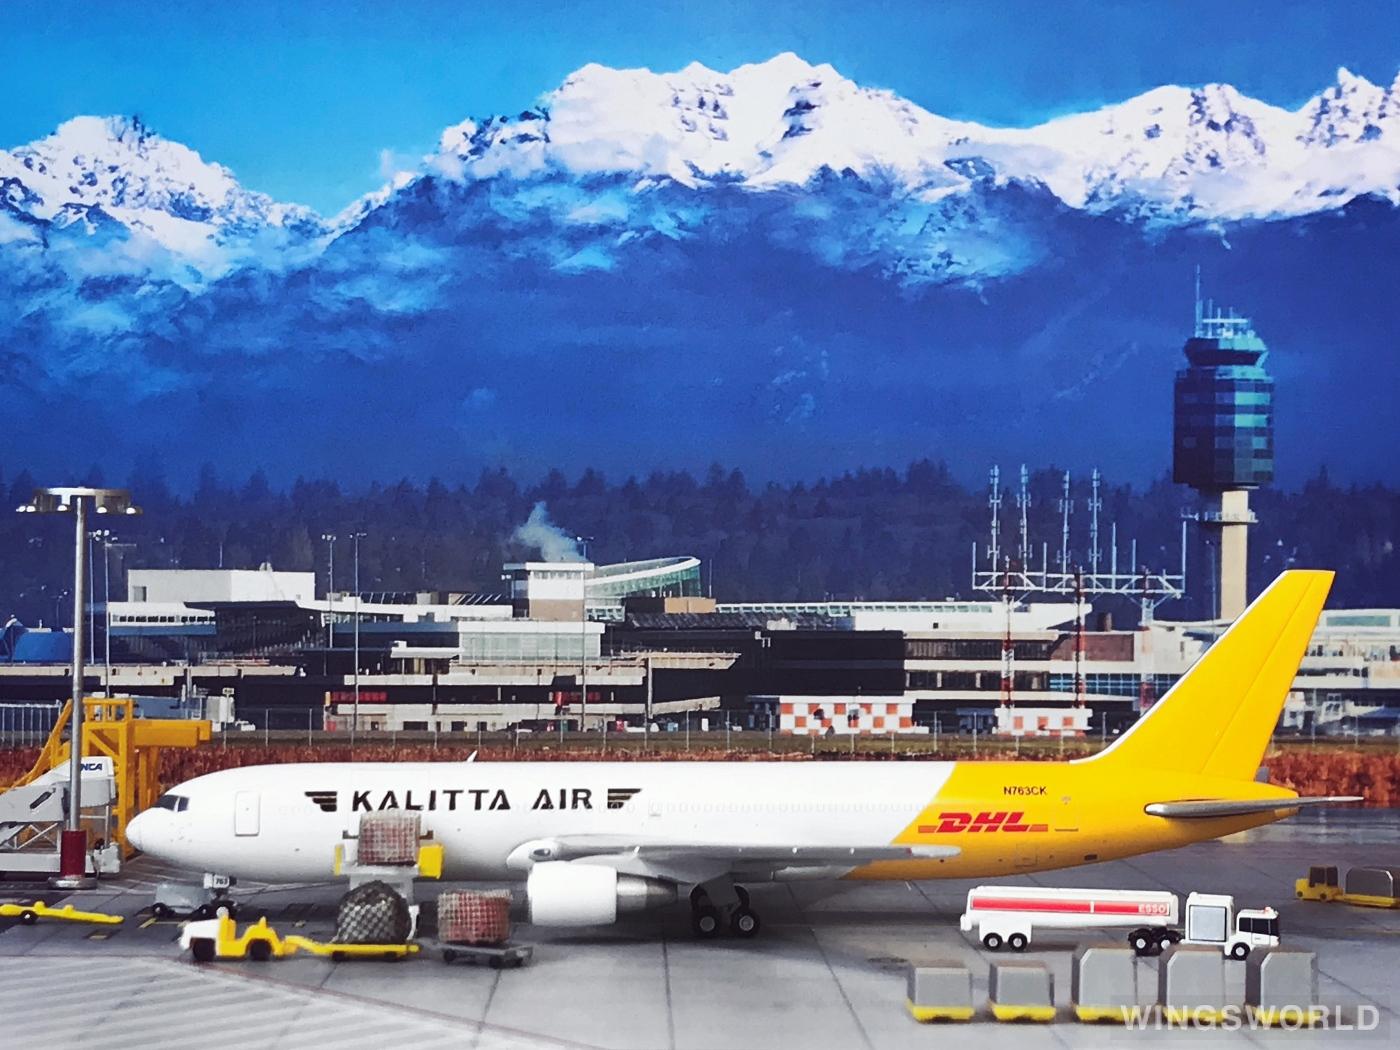 JC Wings 1:400 XX4237 Kalitta Air 卡利塔航空 Boeing 767-300 N763CK